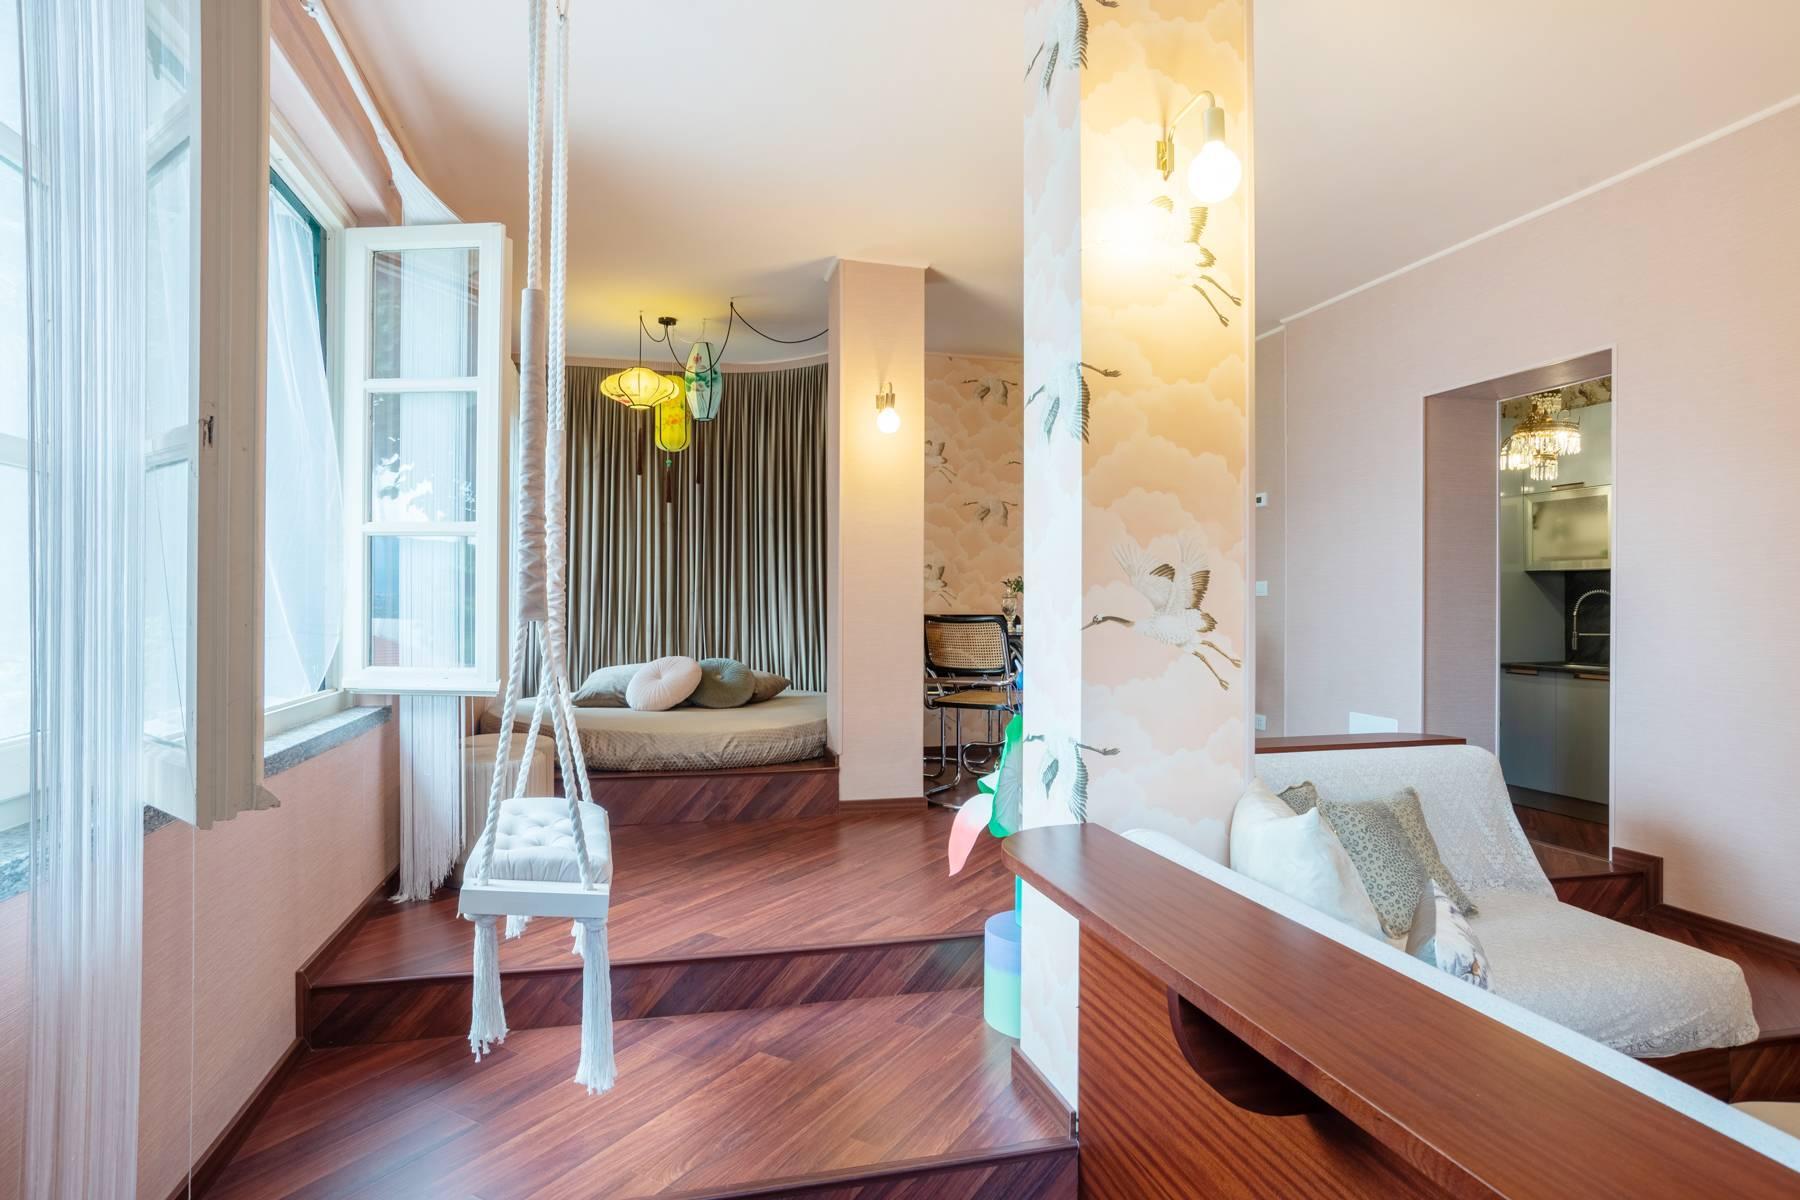 Elegant apartment in the small hamlet of Belgirate - 5